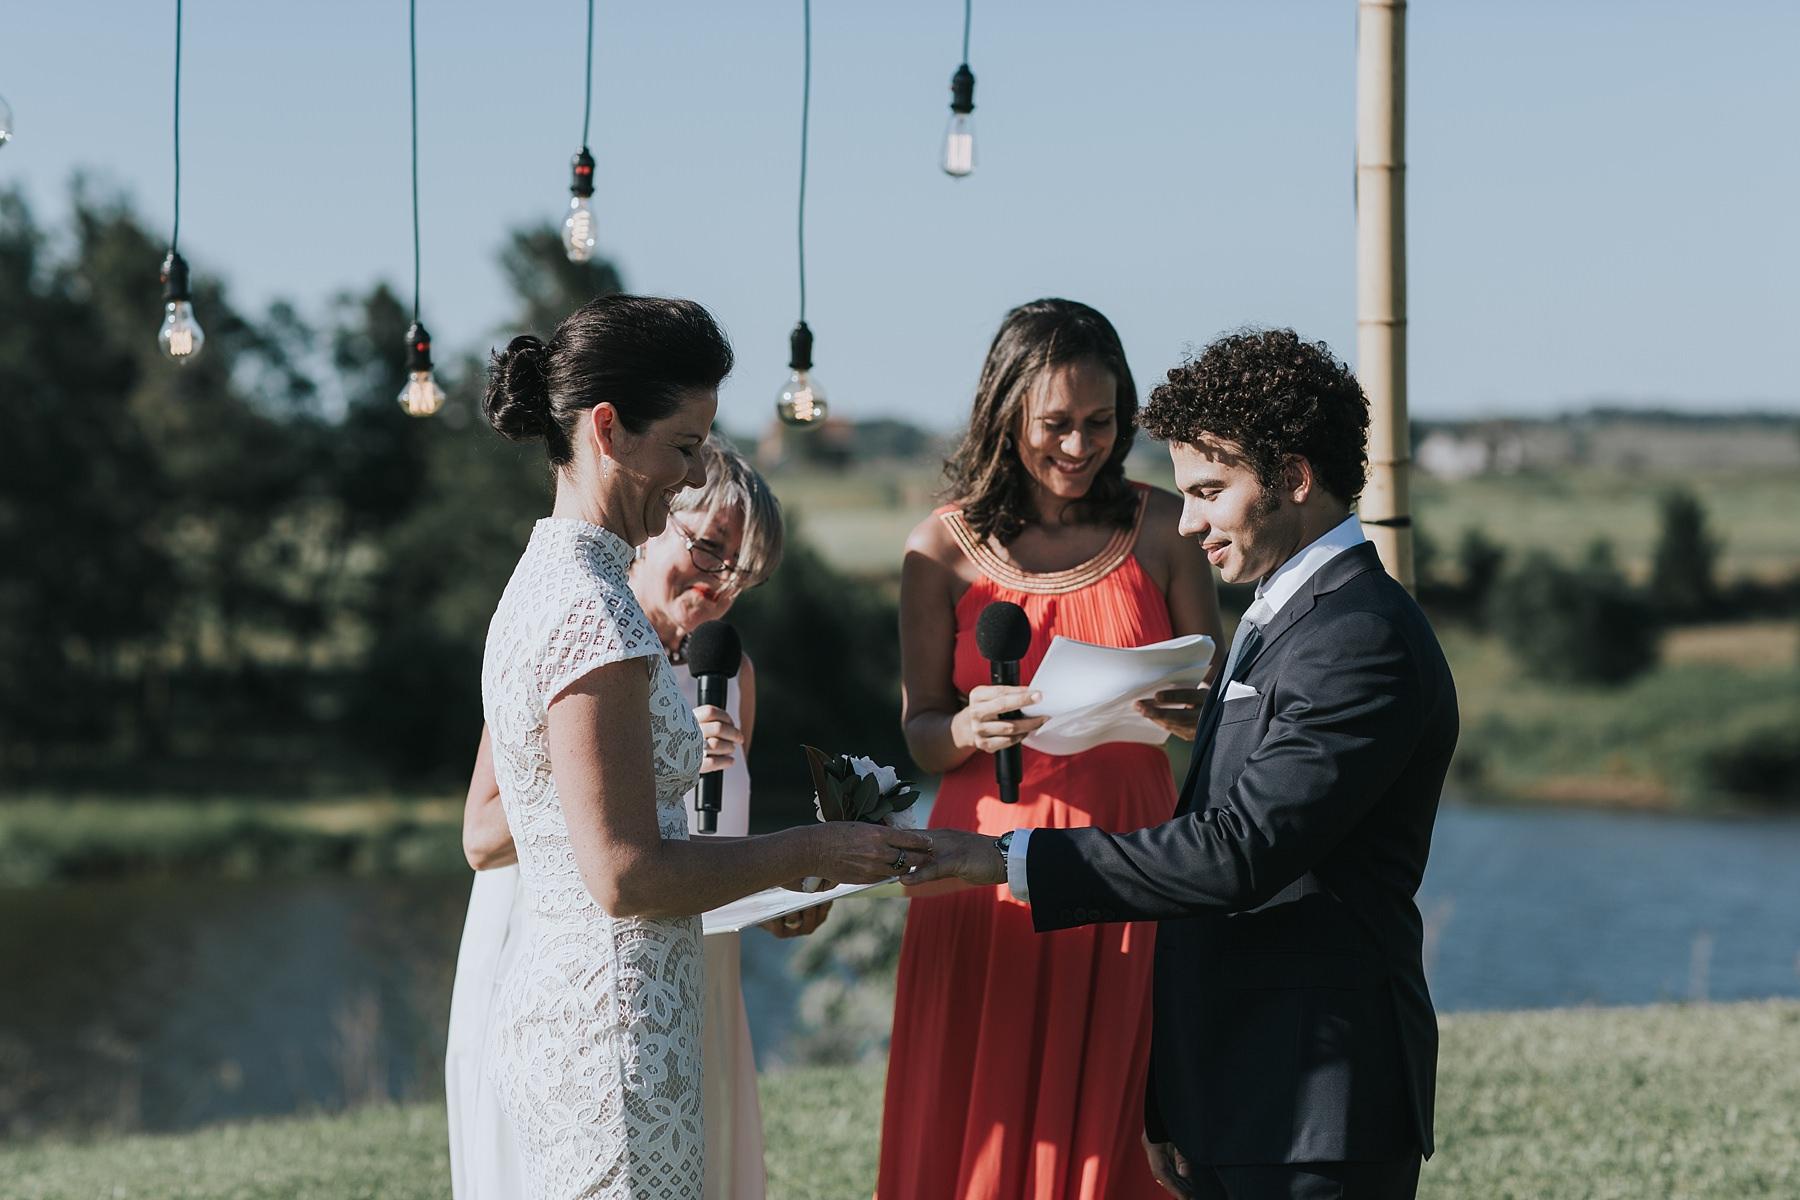 exchanging wedding rings under the arbor at cornwallis house